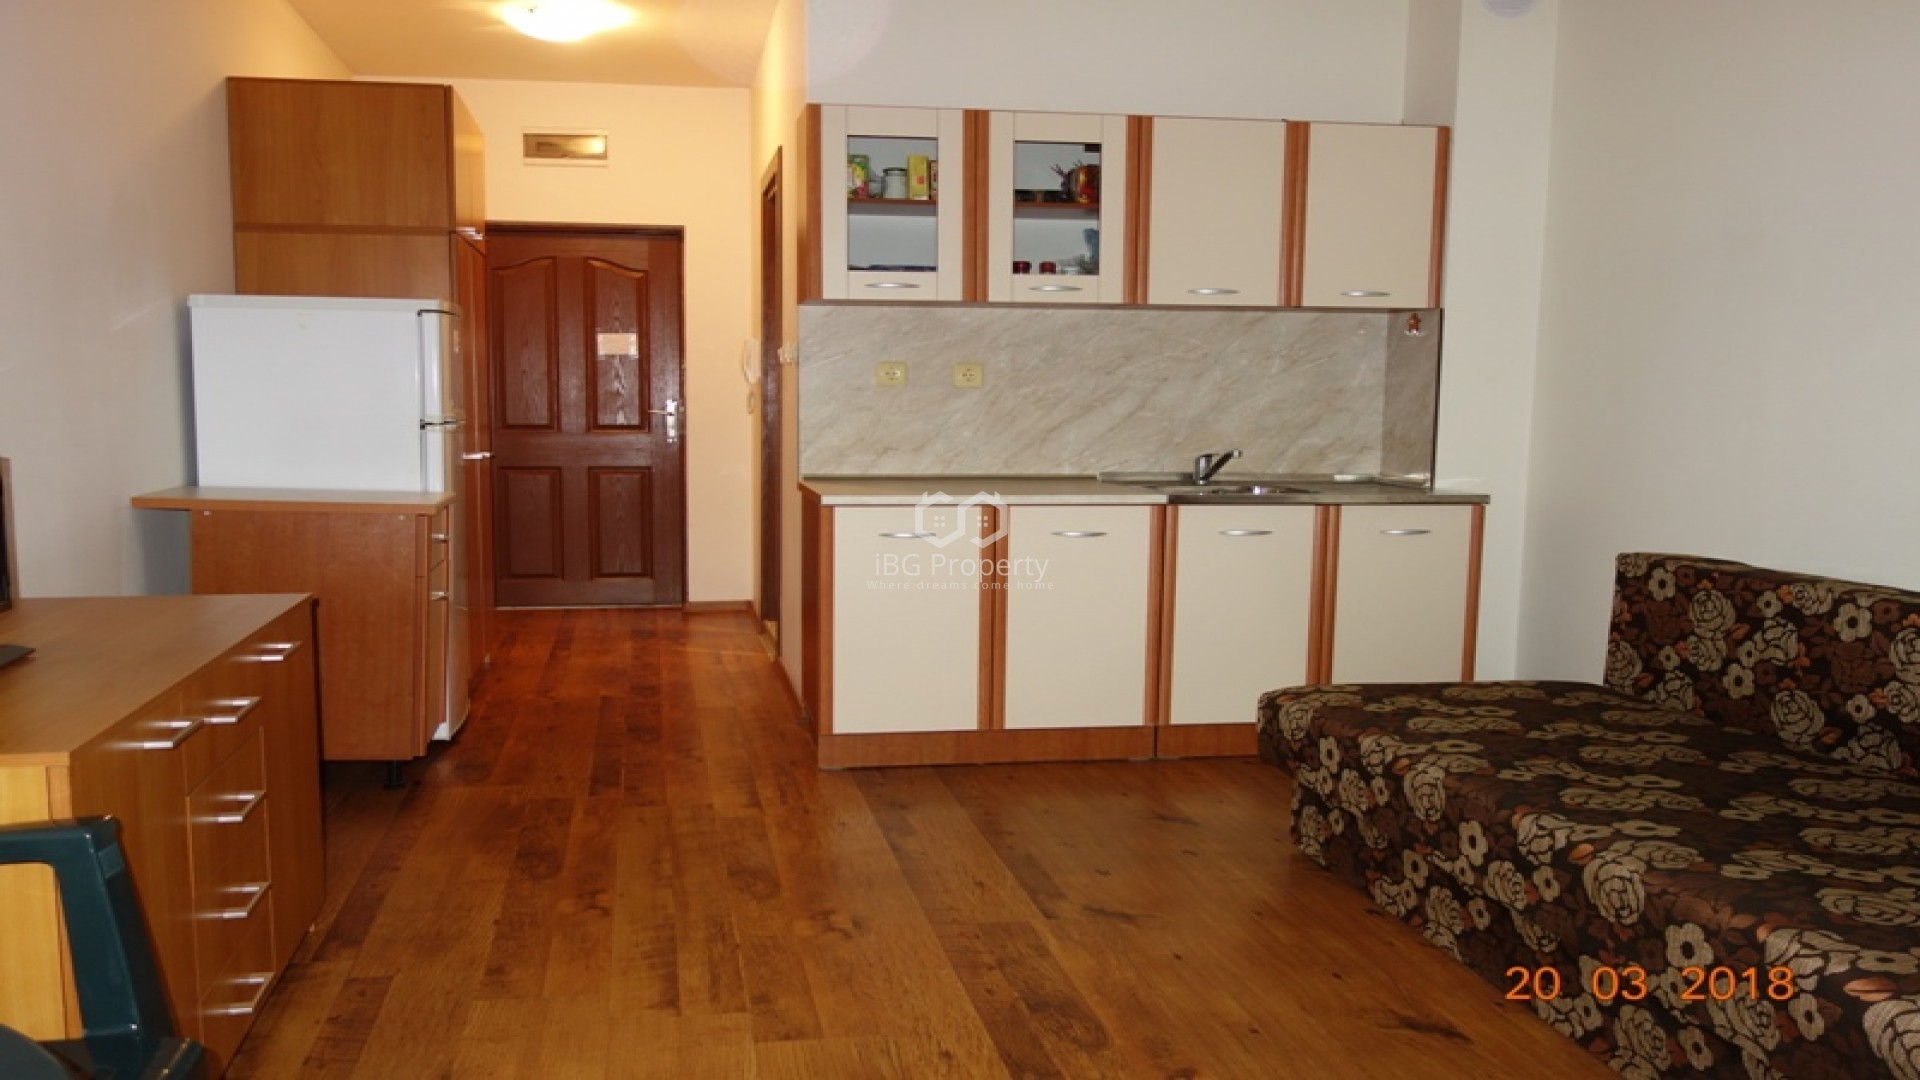 Едностаен апартамент Свети Влас 38 m2